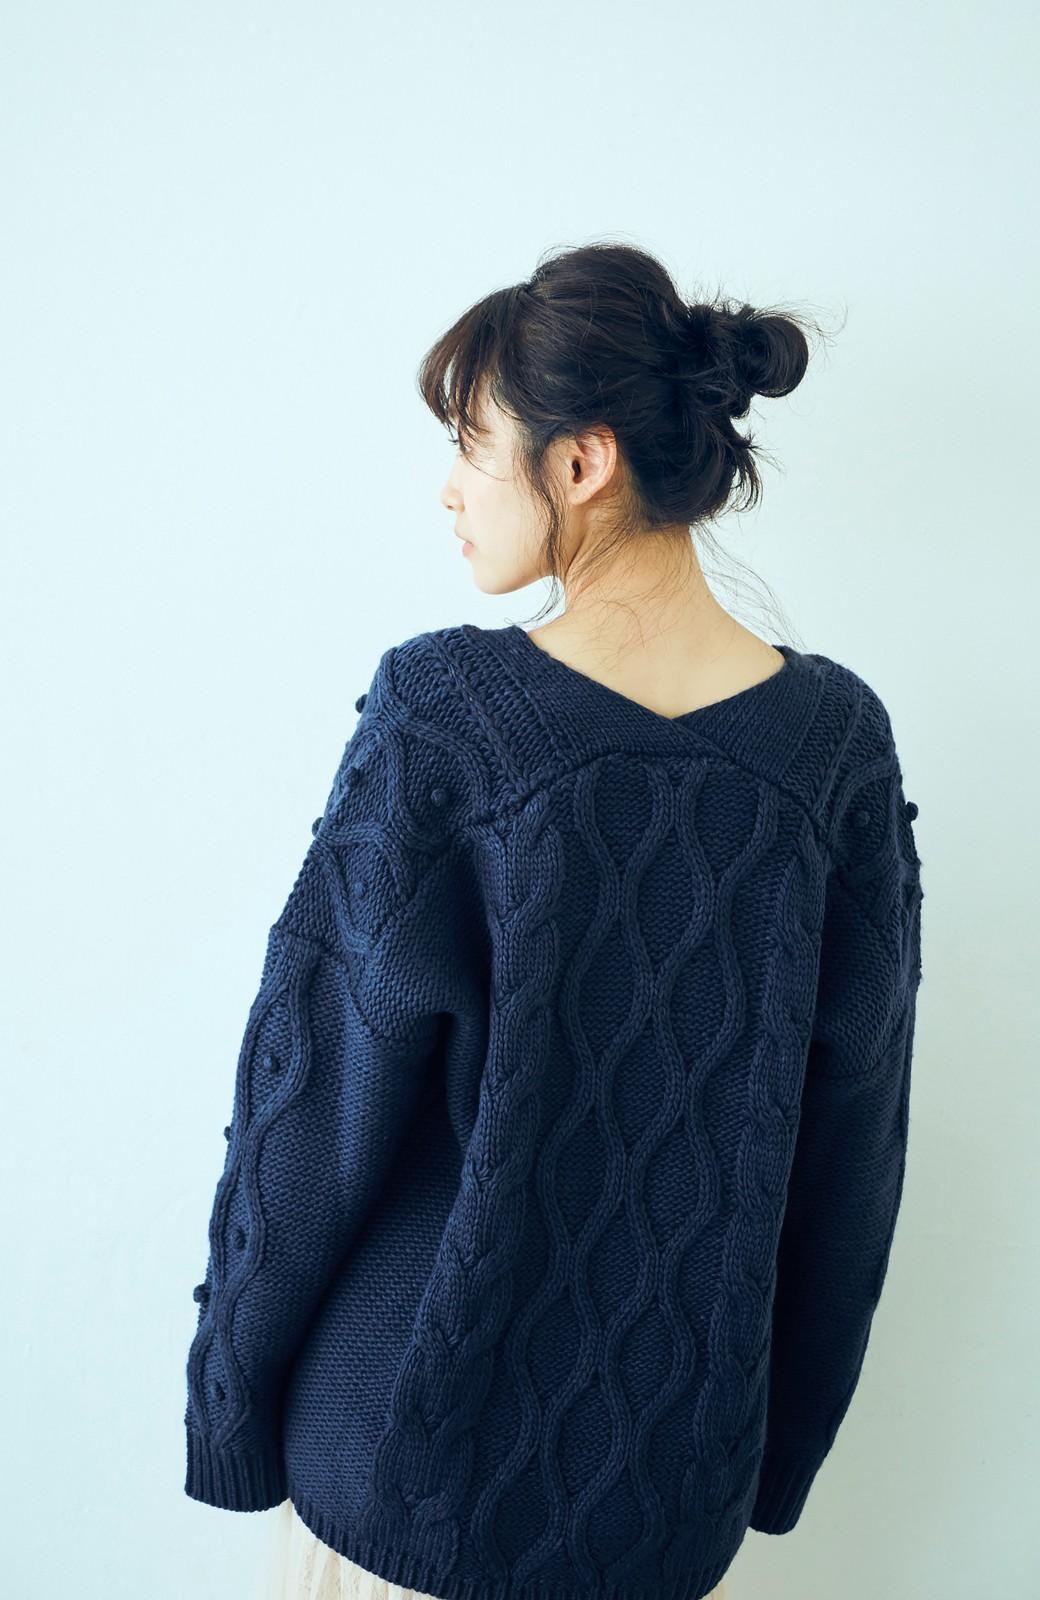 haco! <高橋愛さんコラボ>ラブ&ピースプロジェクト パプコーン編みのウエストマークケーブルニットトップス <ネイビー>の商品写真11